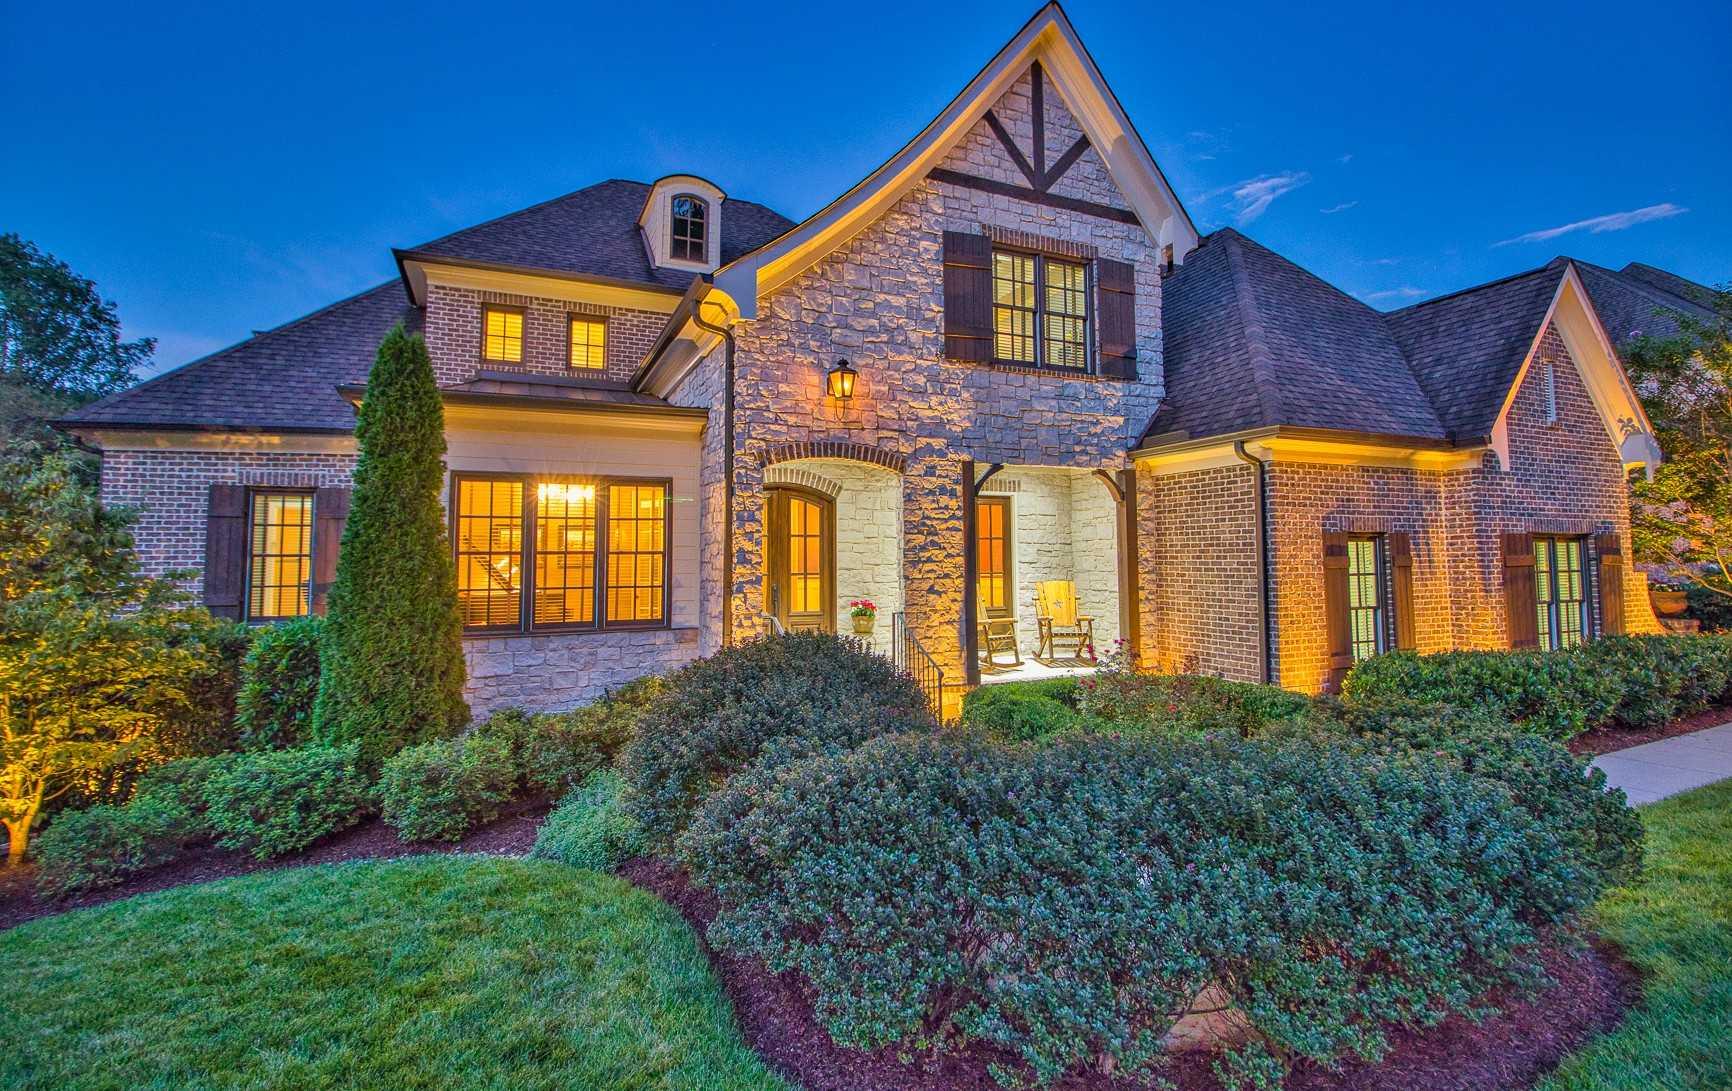 $2,399,900 - 6Br/7Ba -  for Sale in Stockett Creek Sec 2, Nashville